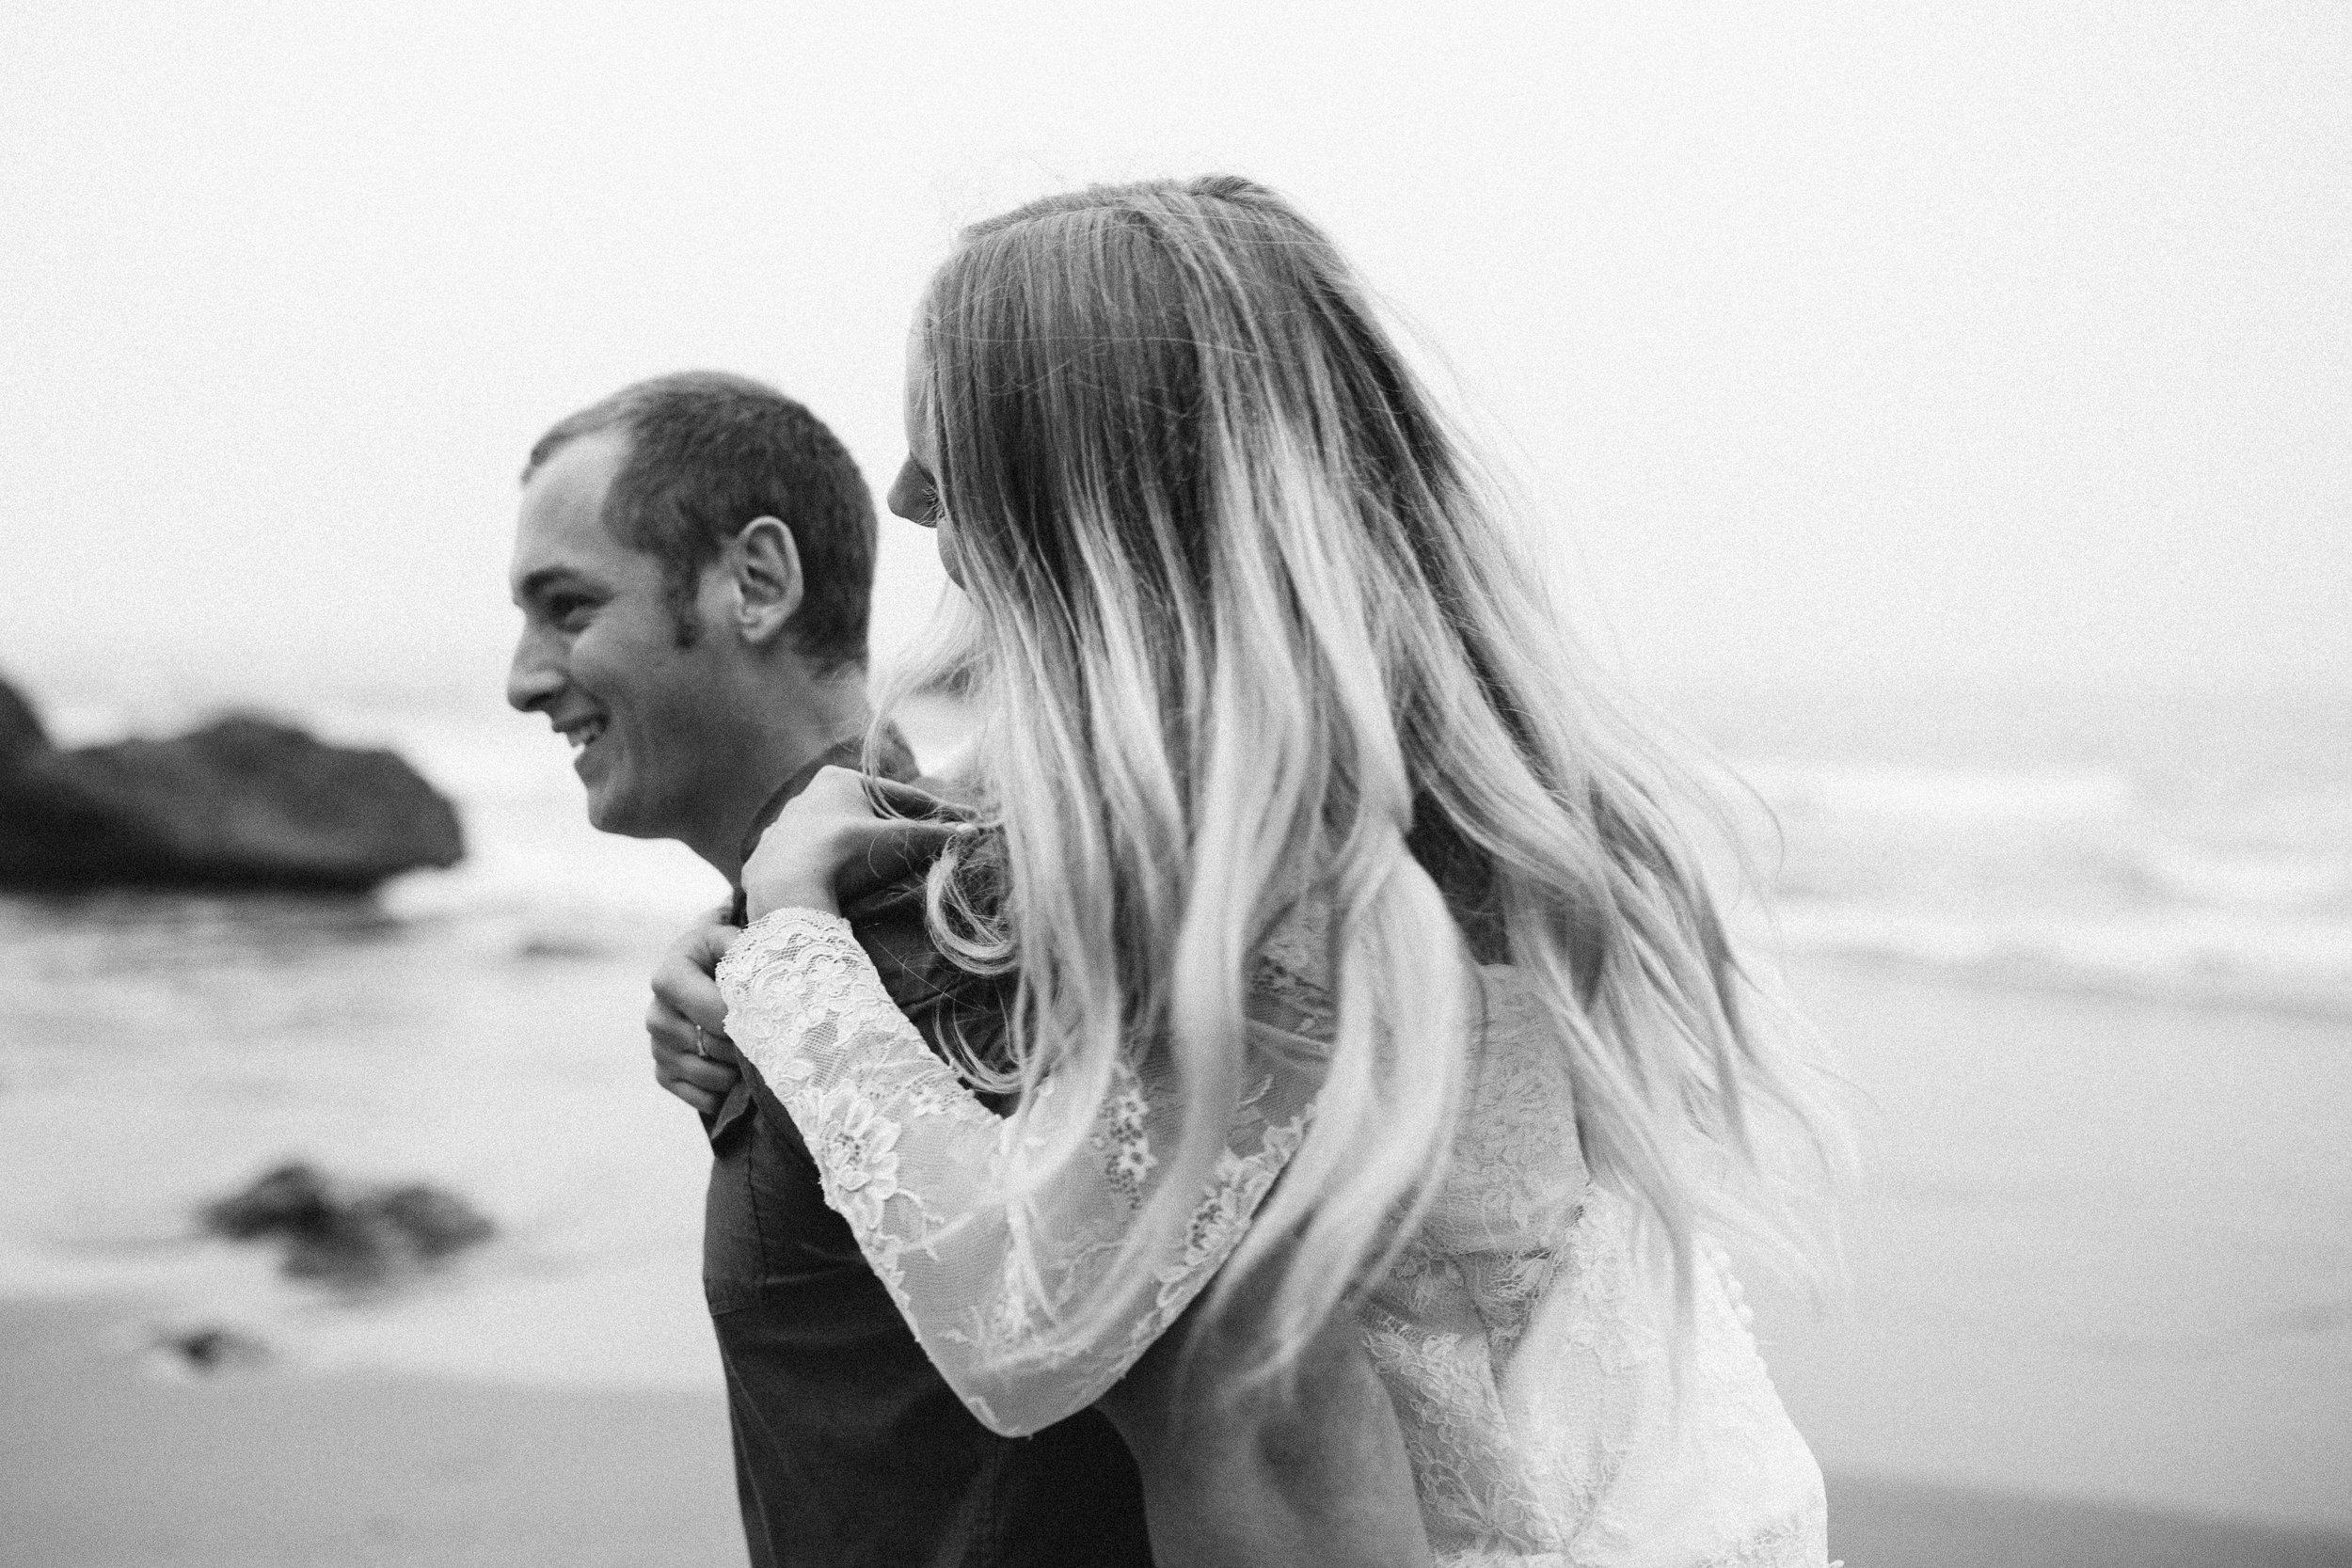 nicole-daacke-photography-ecola-state-park-oregon-elopement-bridal-photos-photographer-for-cannon-beach-elopement-oregon-coast-elopement-photographer-foggy-summer-elopement-cannon-beach-best-adventure-elopement-photographer-7097.jpg